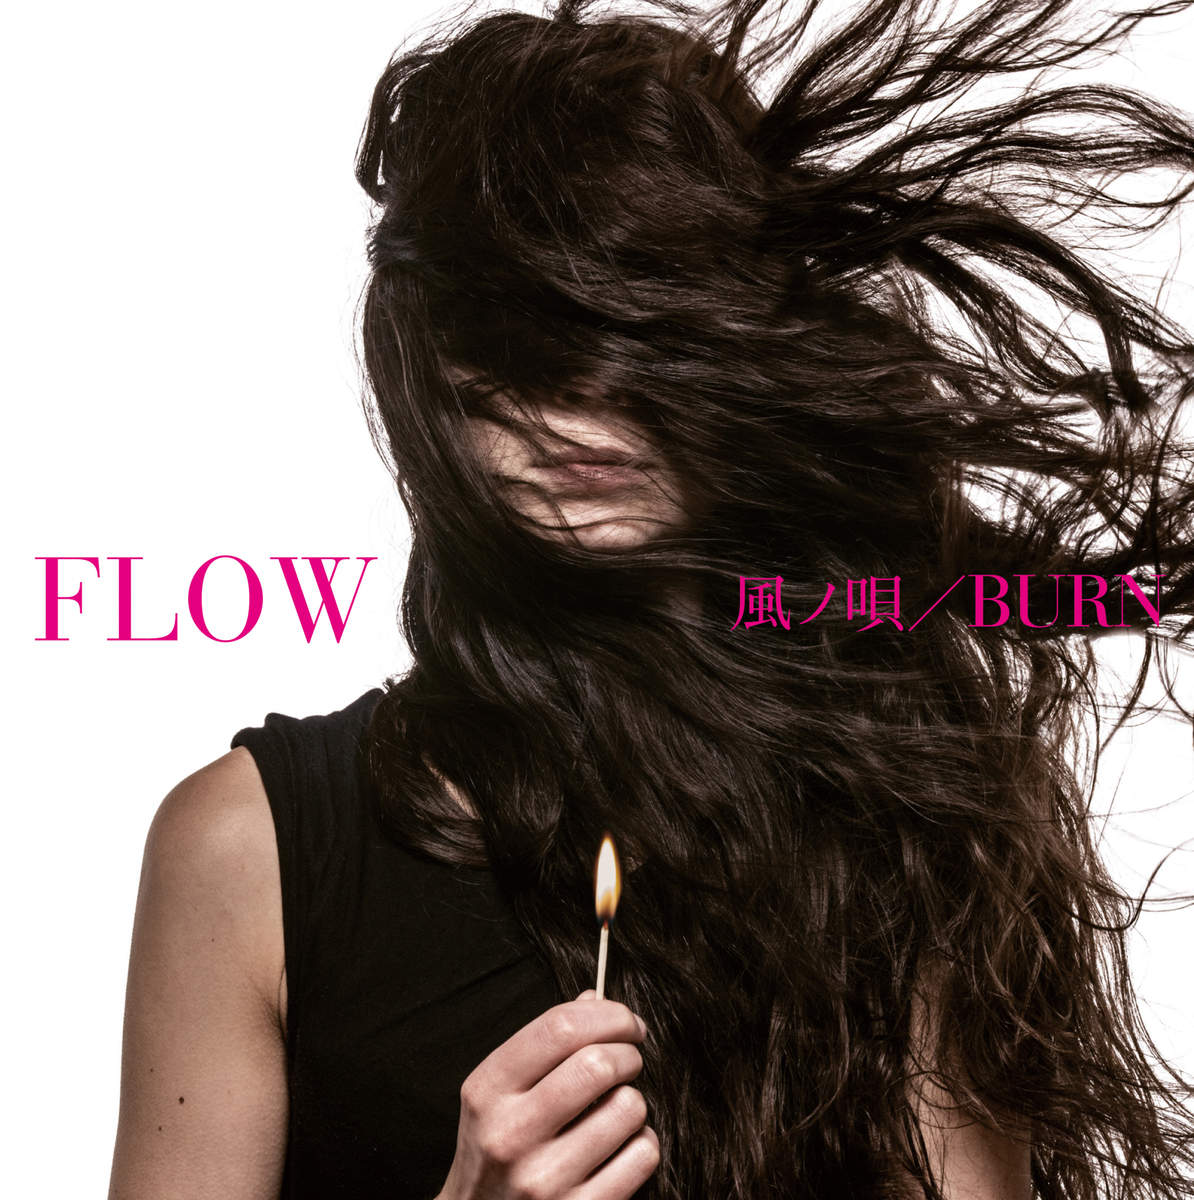 flow fuyu no amaoto mp3